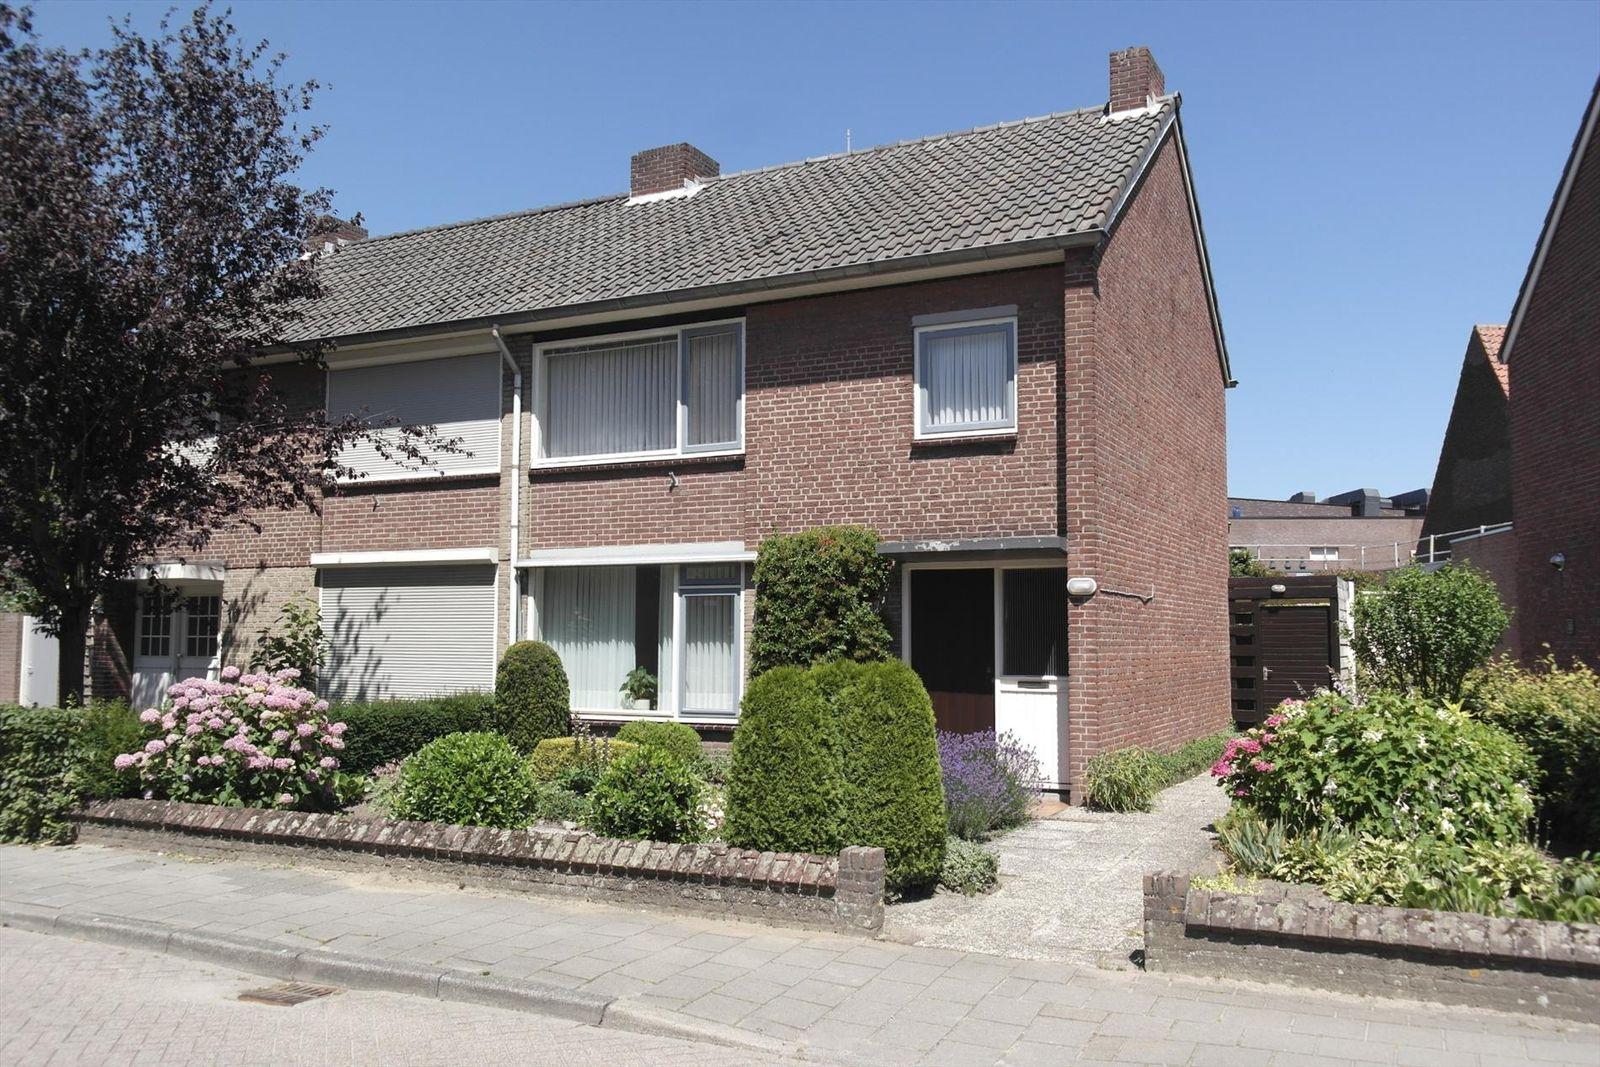 Willem II straat 8, Budel